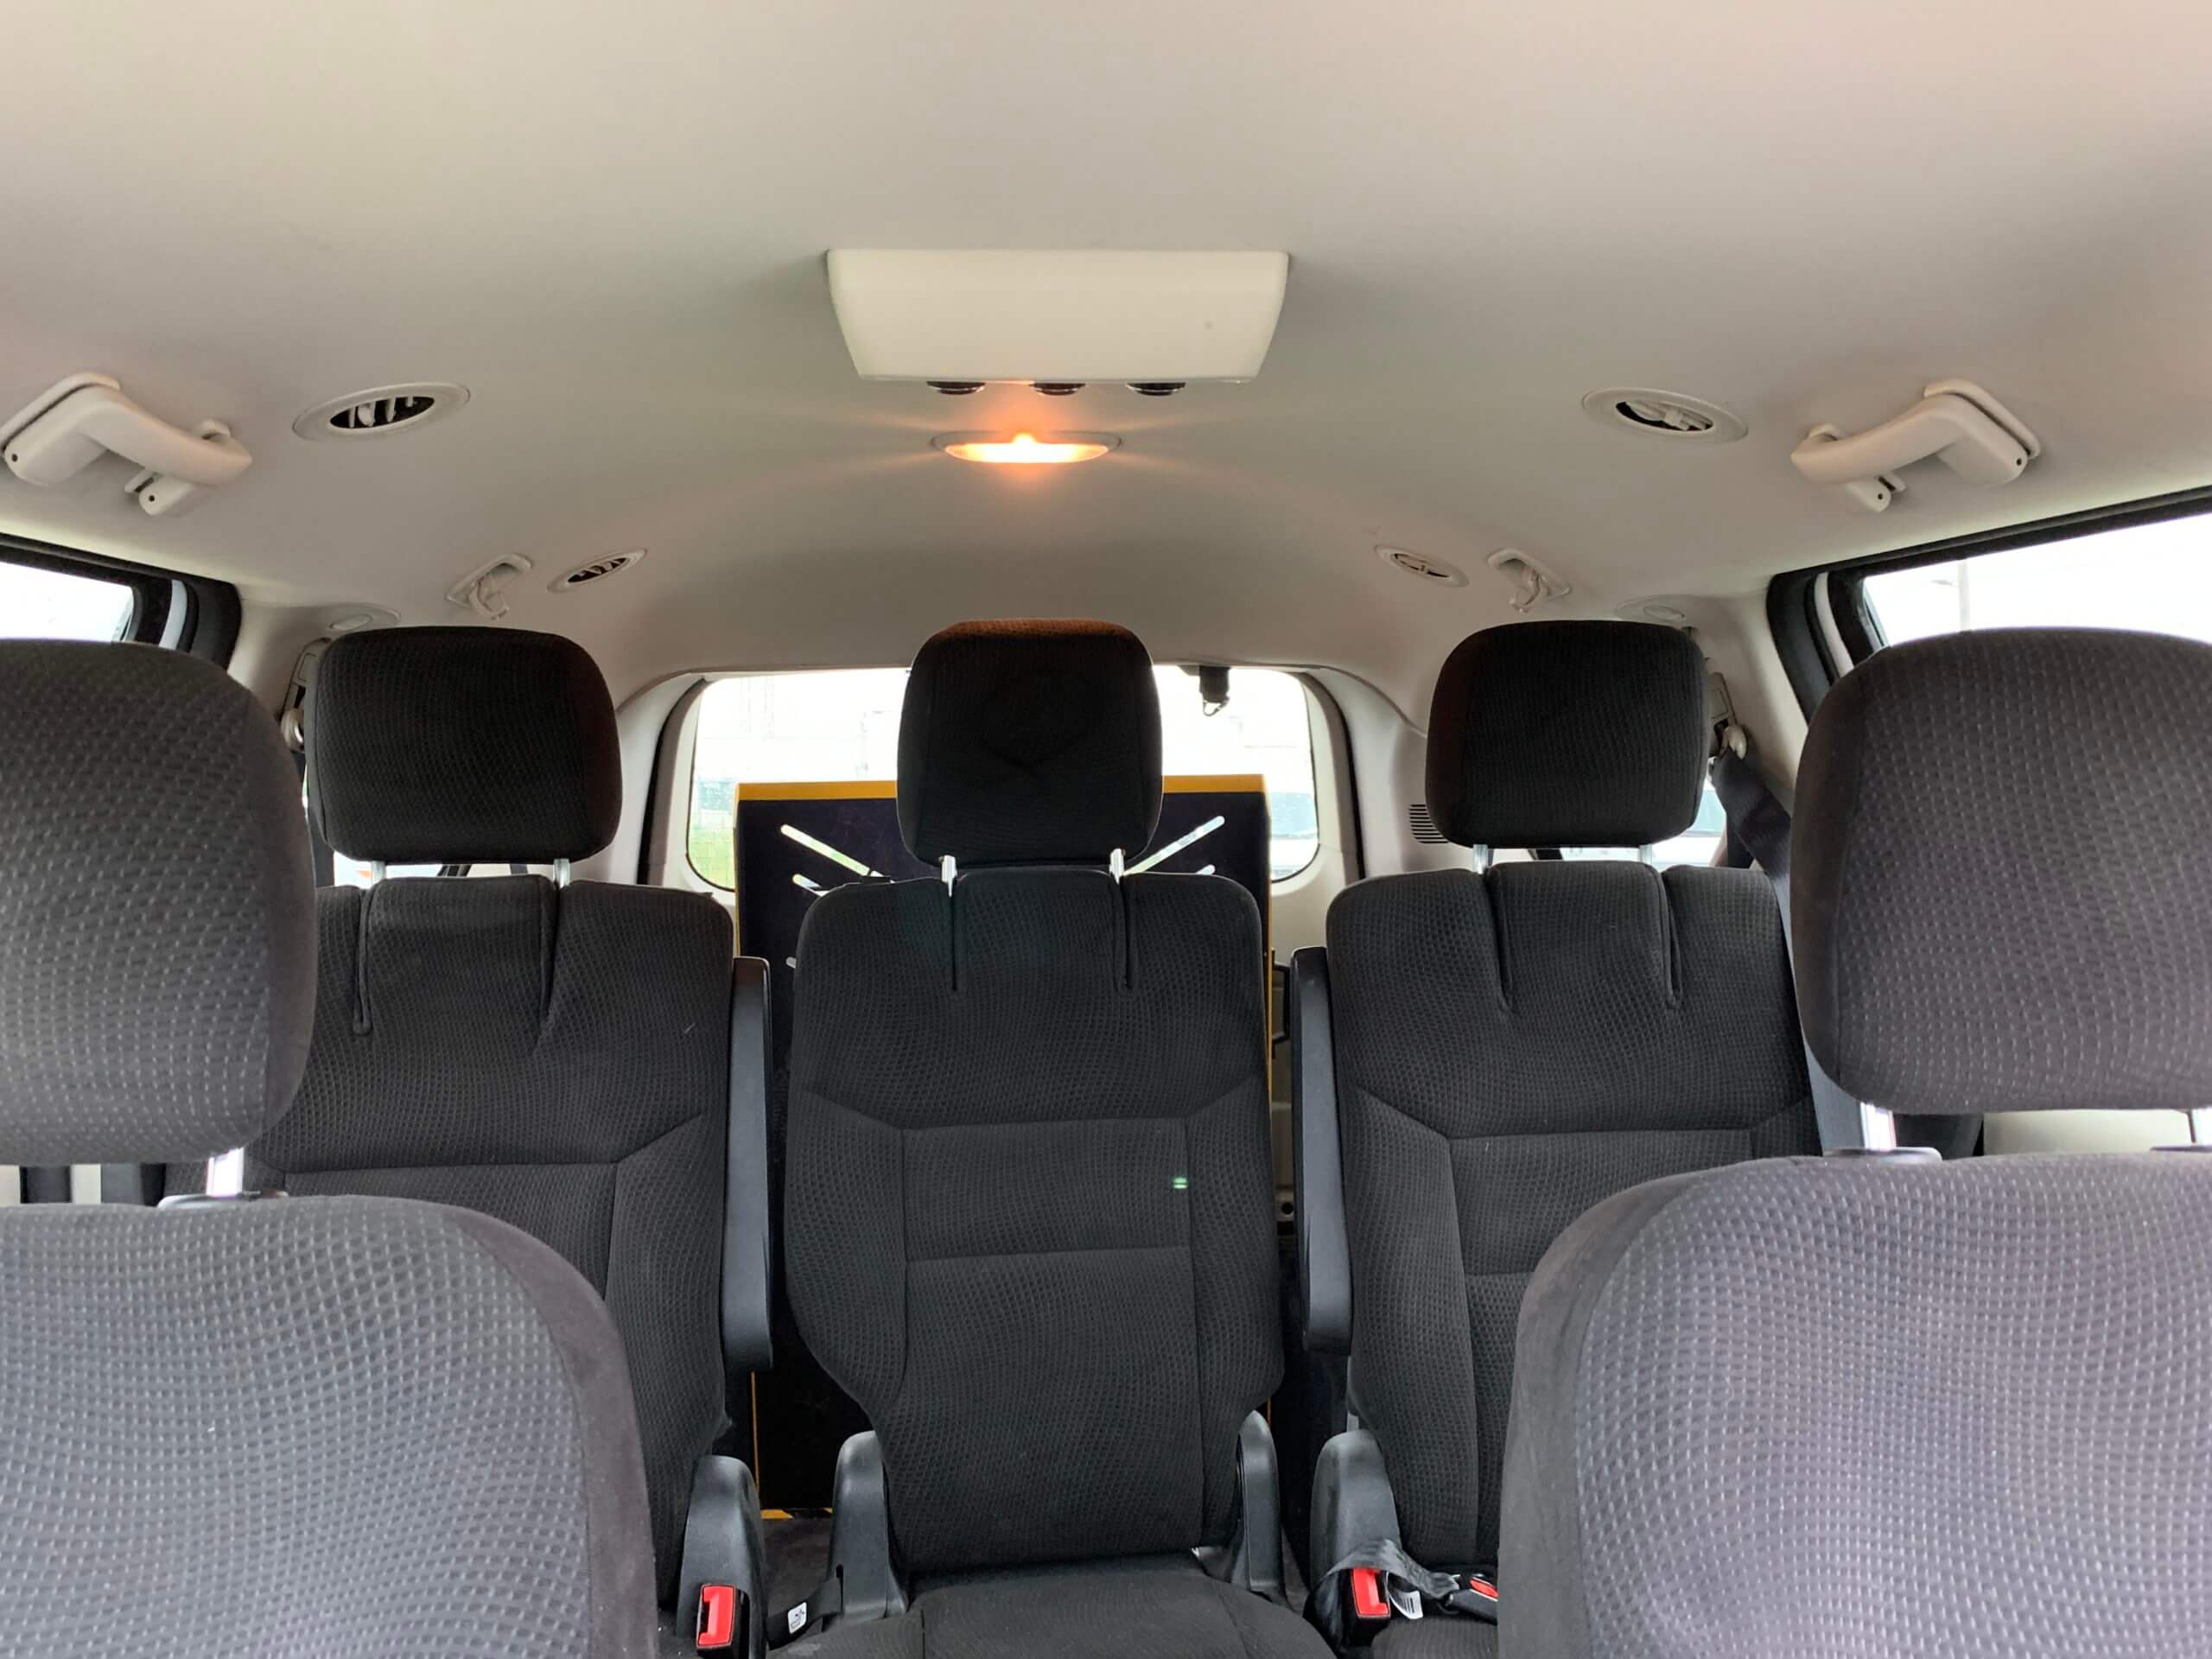 Interior backseat view of 2015 Dodge Grand Caravan SXT